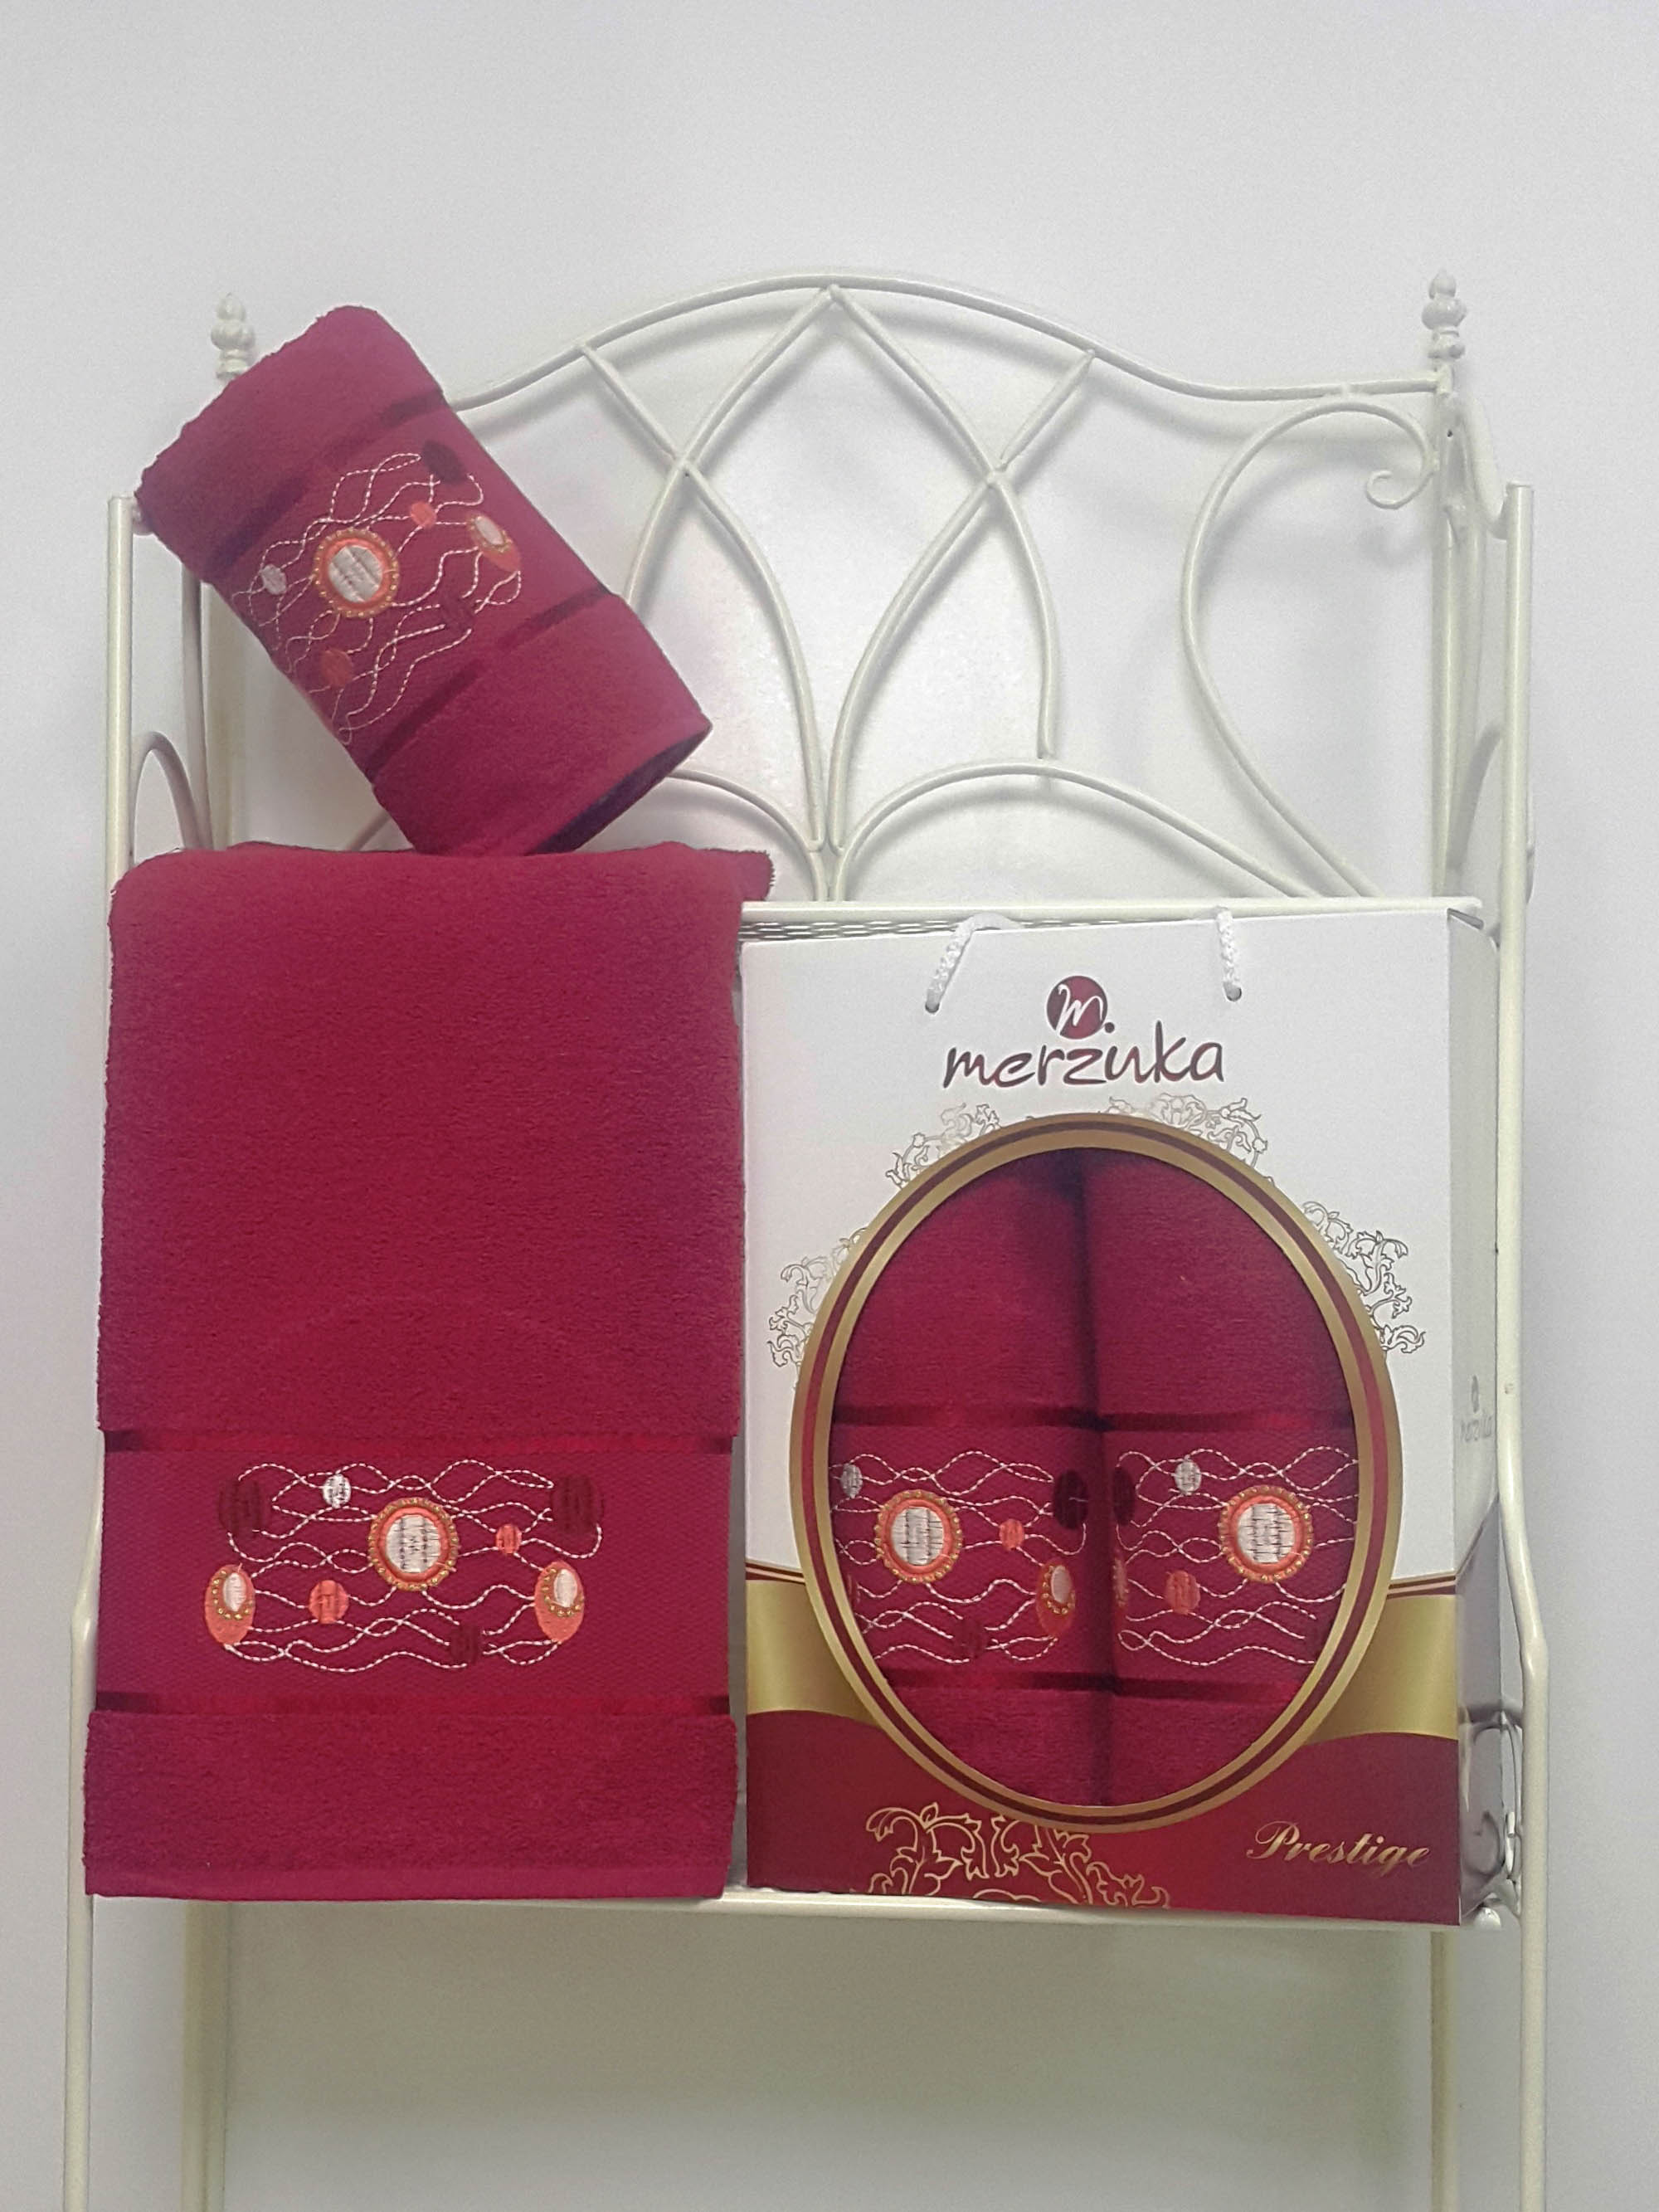 Полотенца Oran Merzuka Набор из 2 полотенец Prestij Цвет: Бордовый набор из 2 полотенец merzuka sakura 50х90 70х140 8430 кремовый